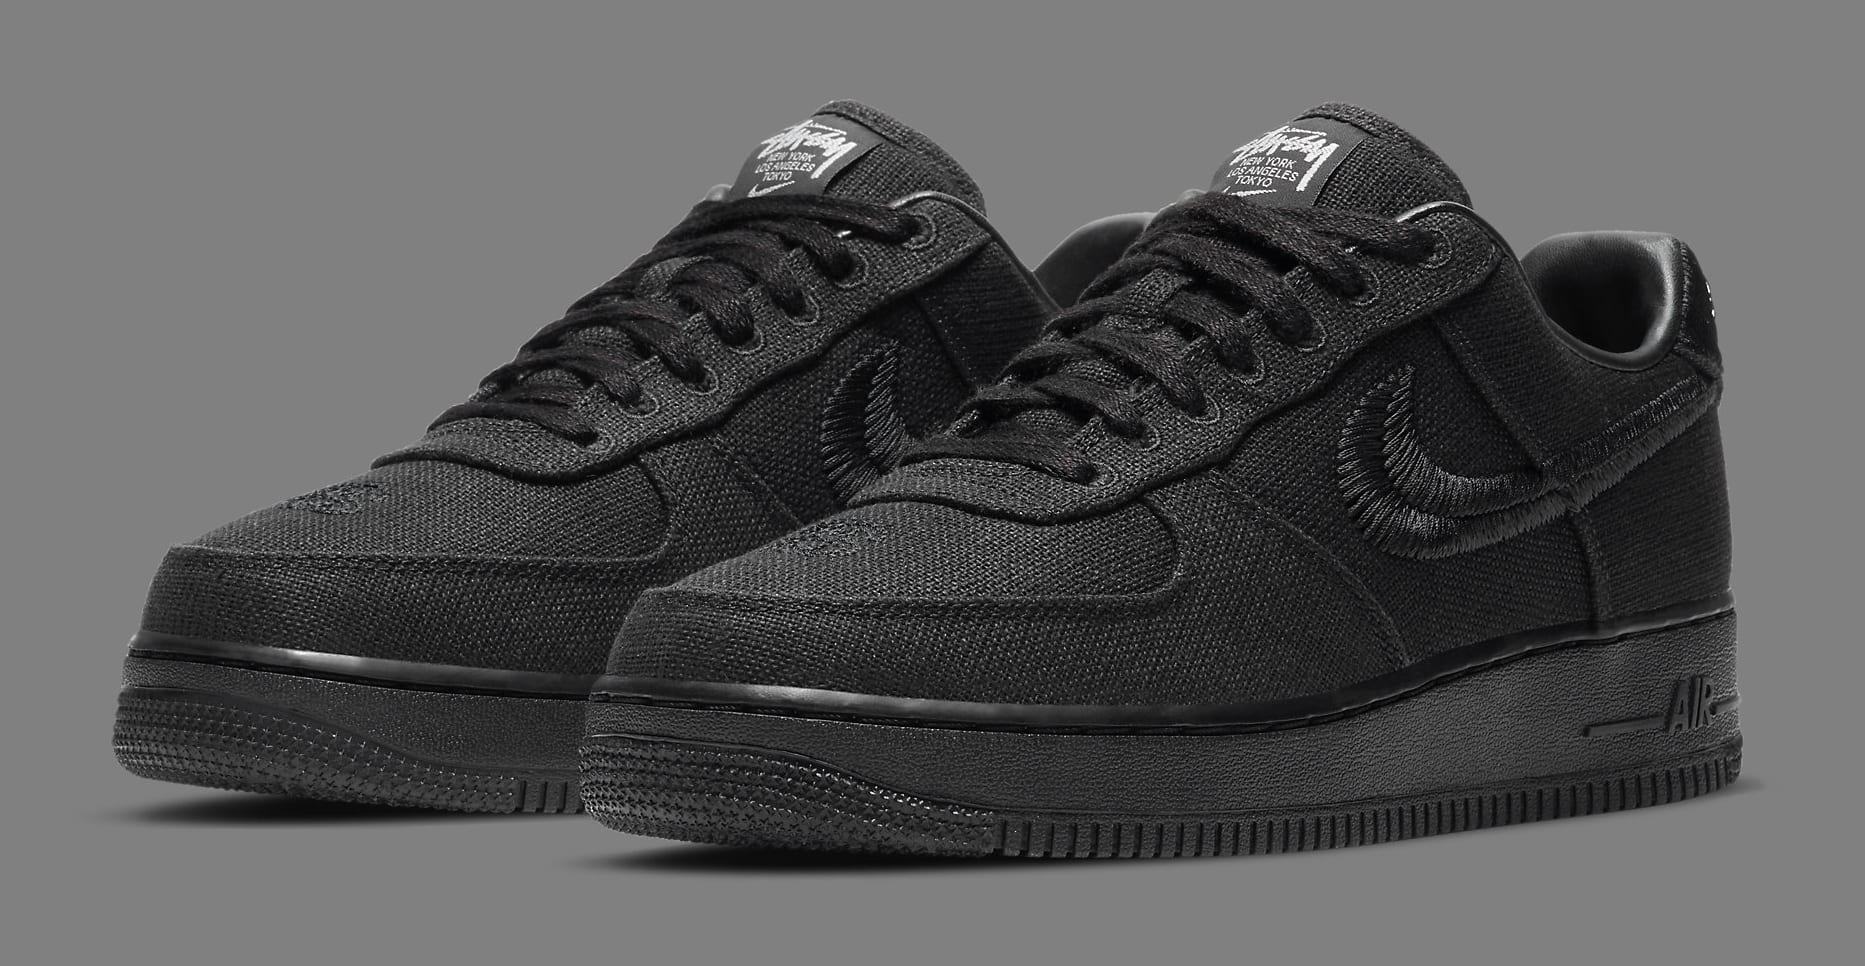 Stussy x Nike Air Force 1 Low 'Black' CZ9084-001 Pair